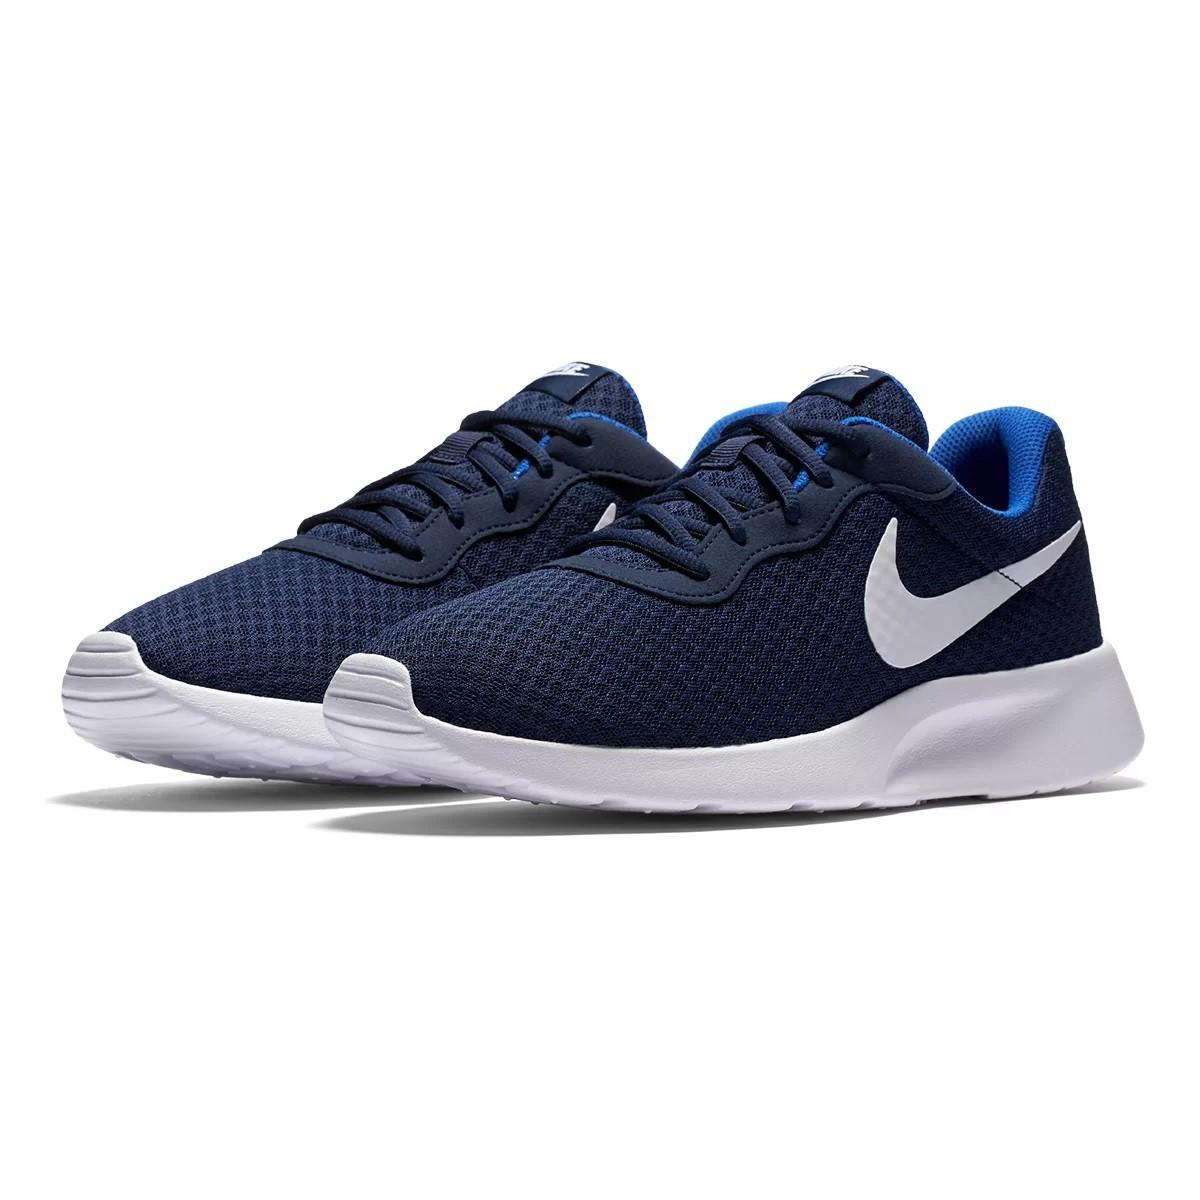 Tênis Nike Tanjun Masculino Marinho e Branco